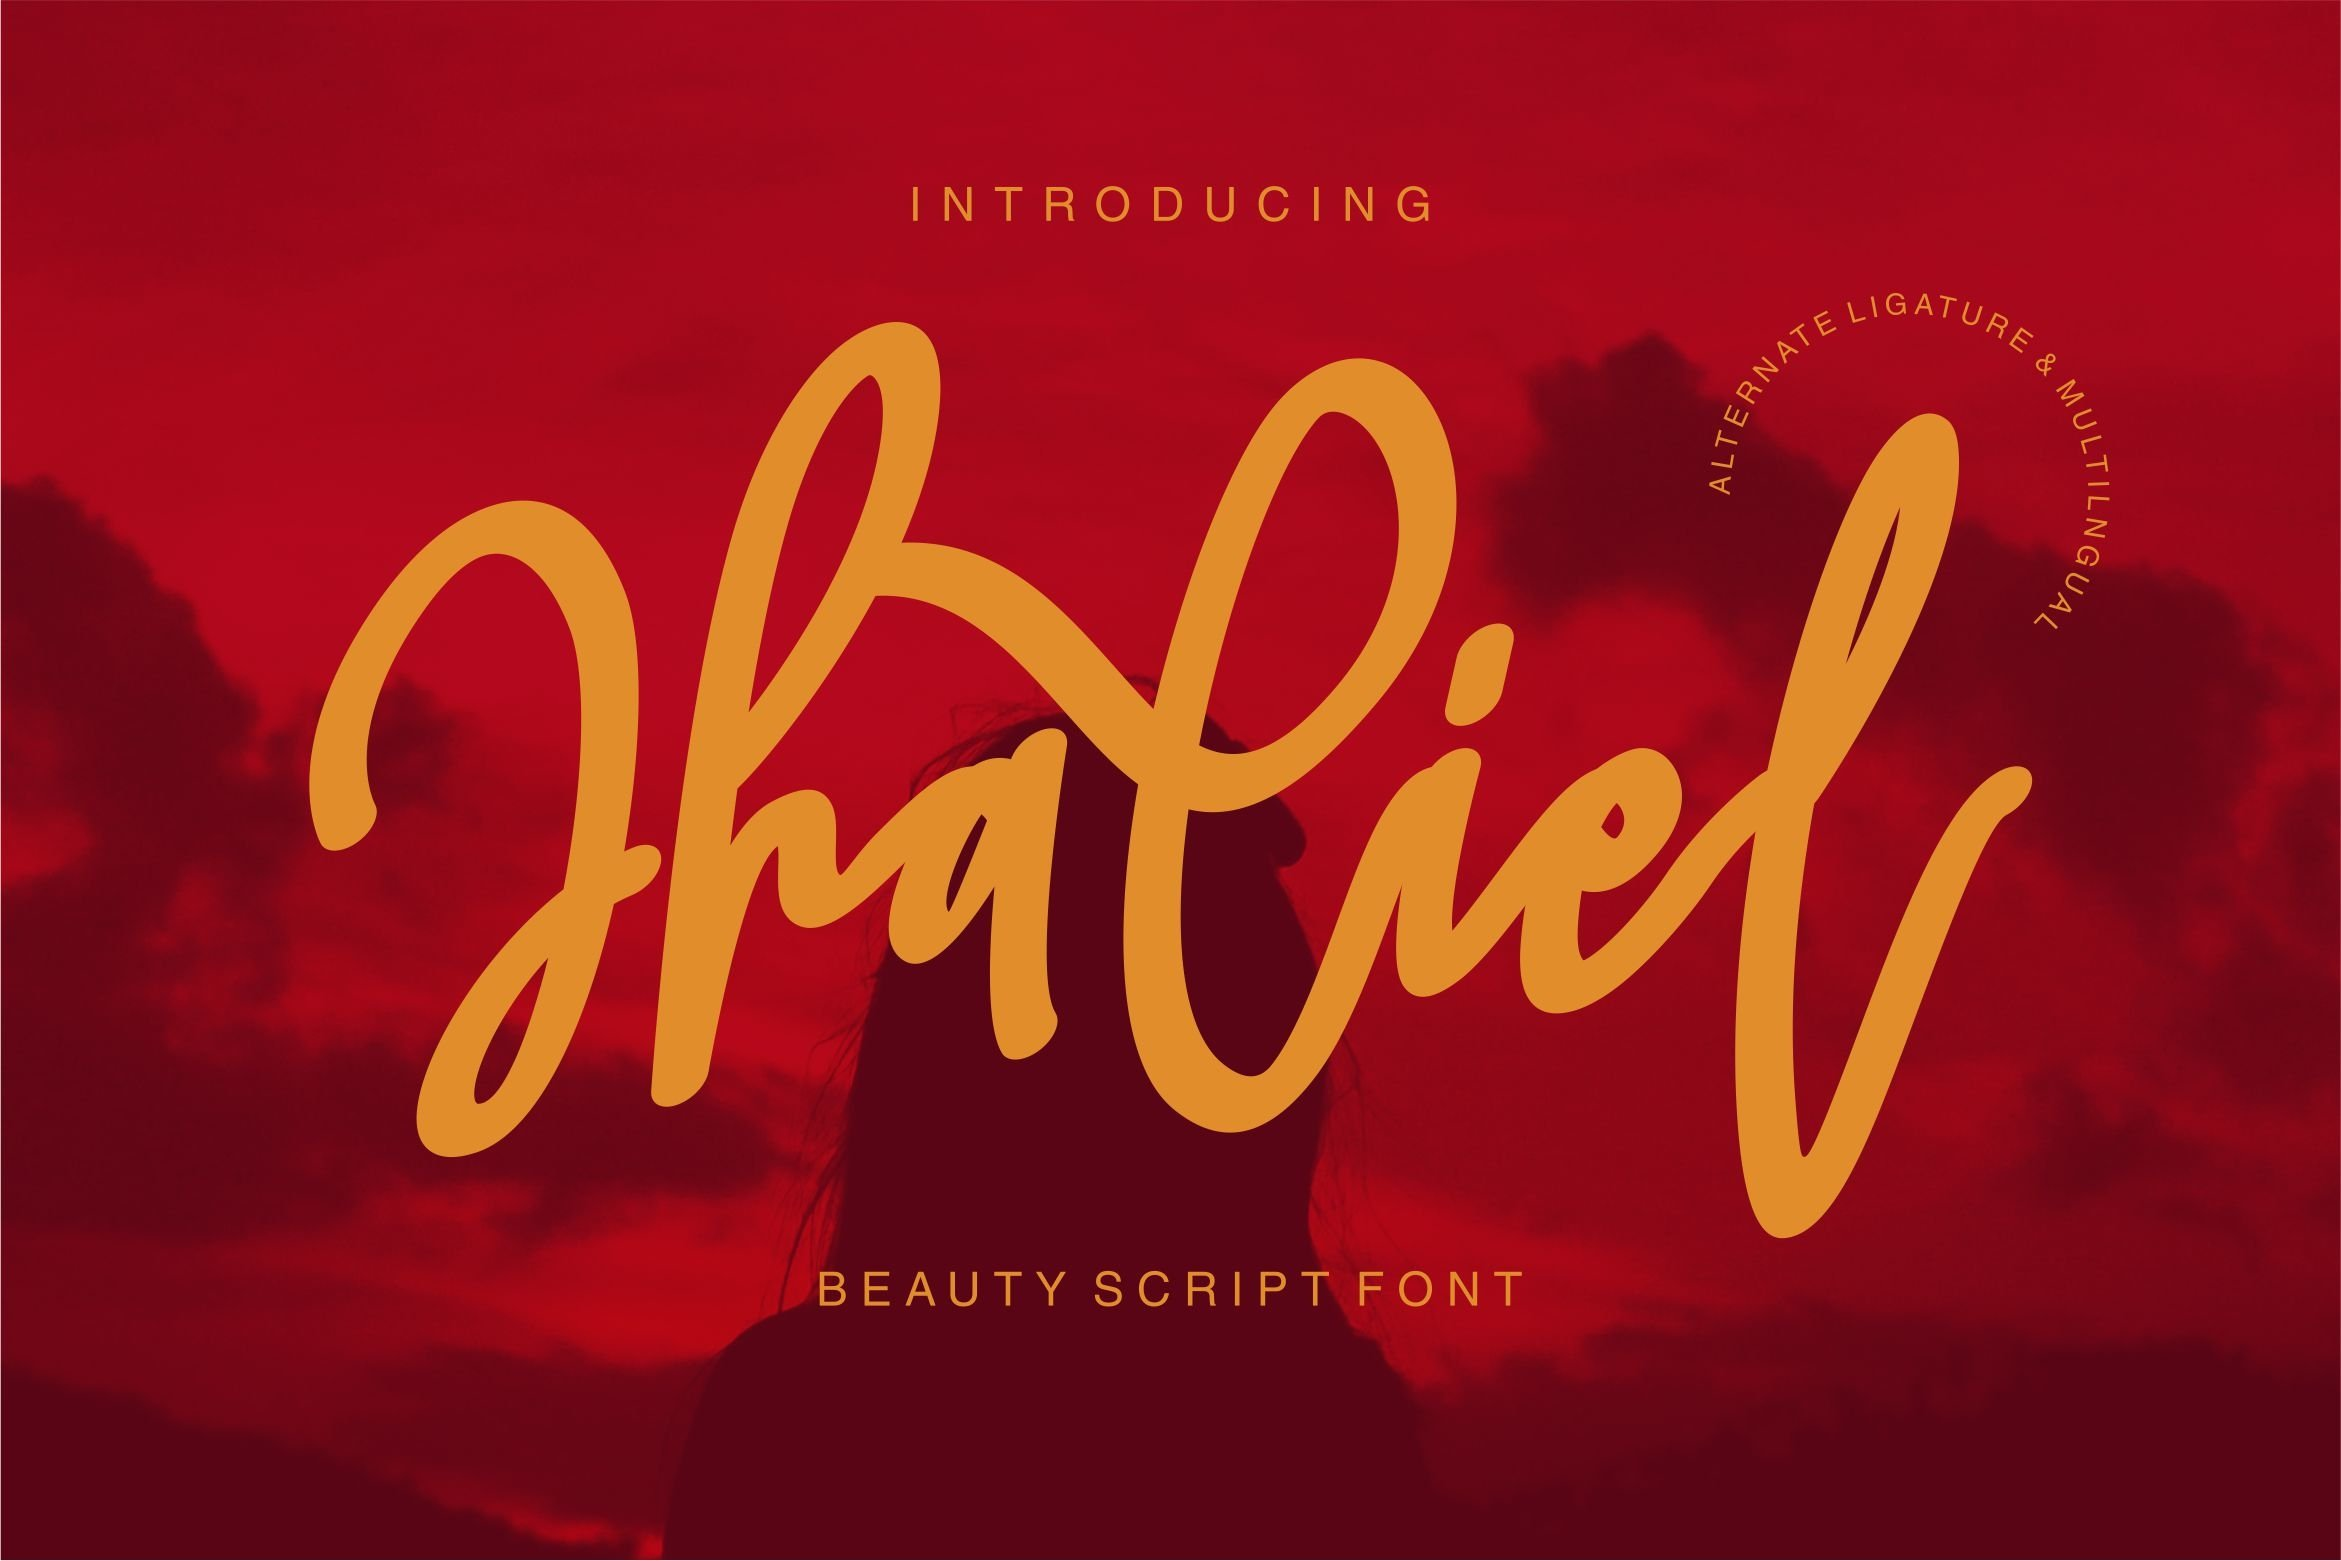 Jhaliel - Beauty Script Font example image 1